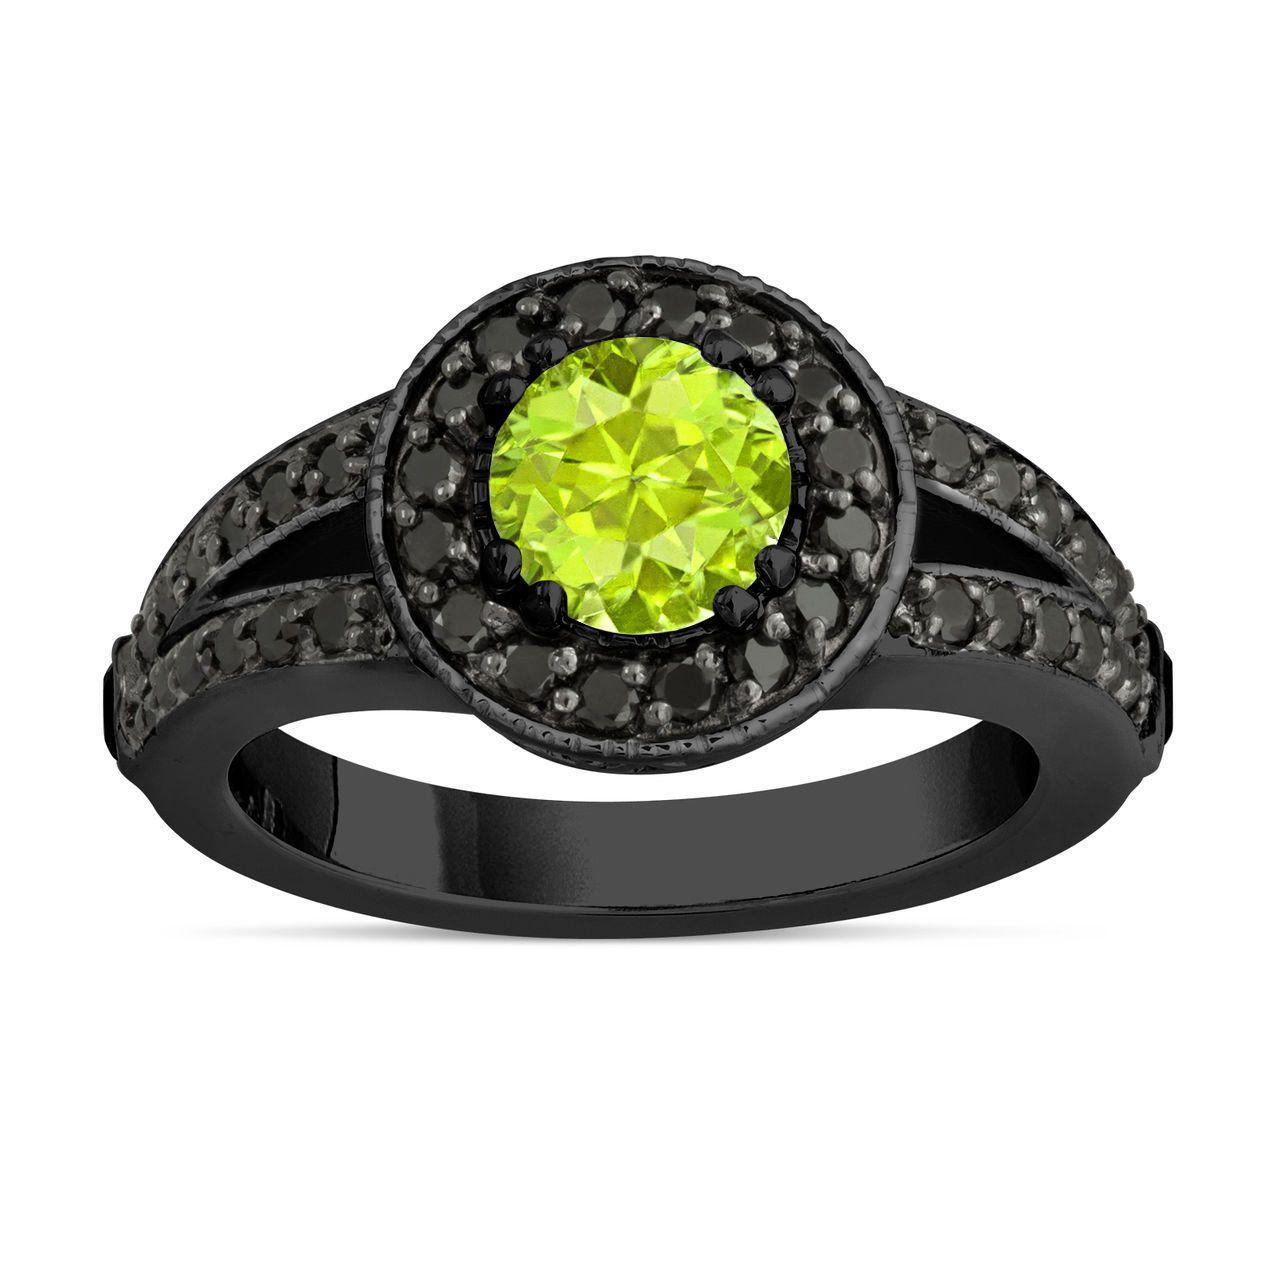 Jewelry & Watches Diamond Black Diamond Engagement Ring 3.34 Ct Diamond Silver Ring New Handmade